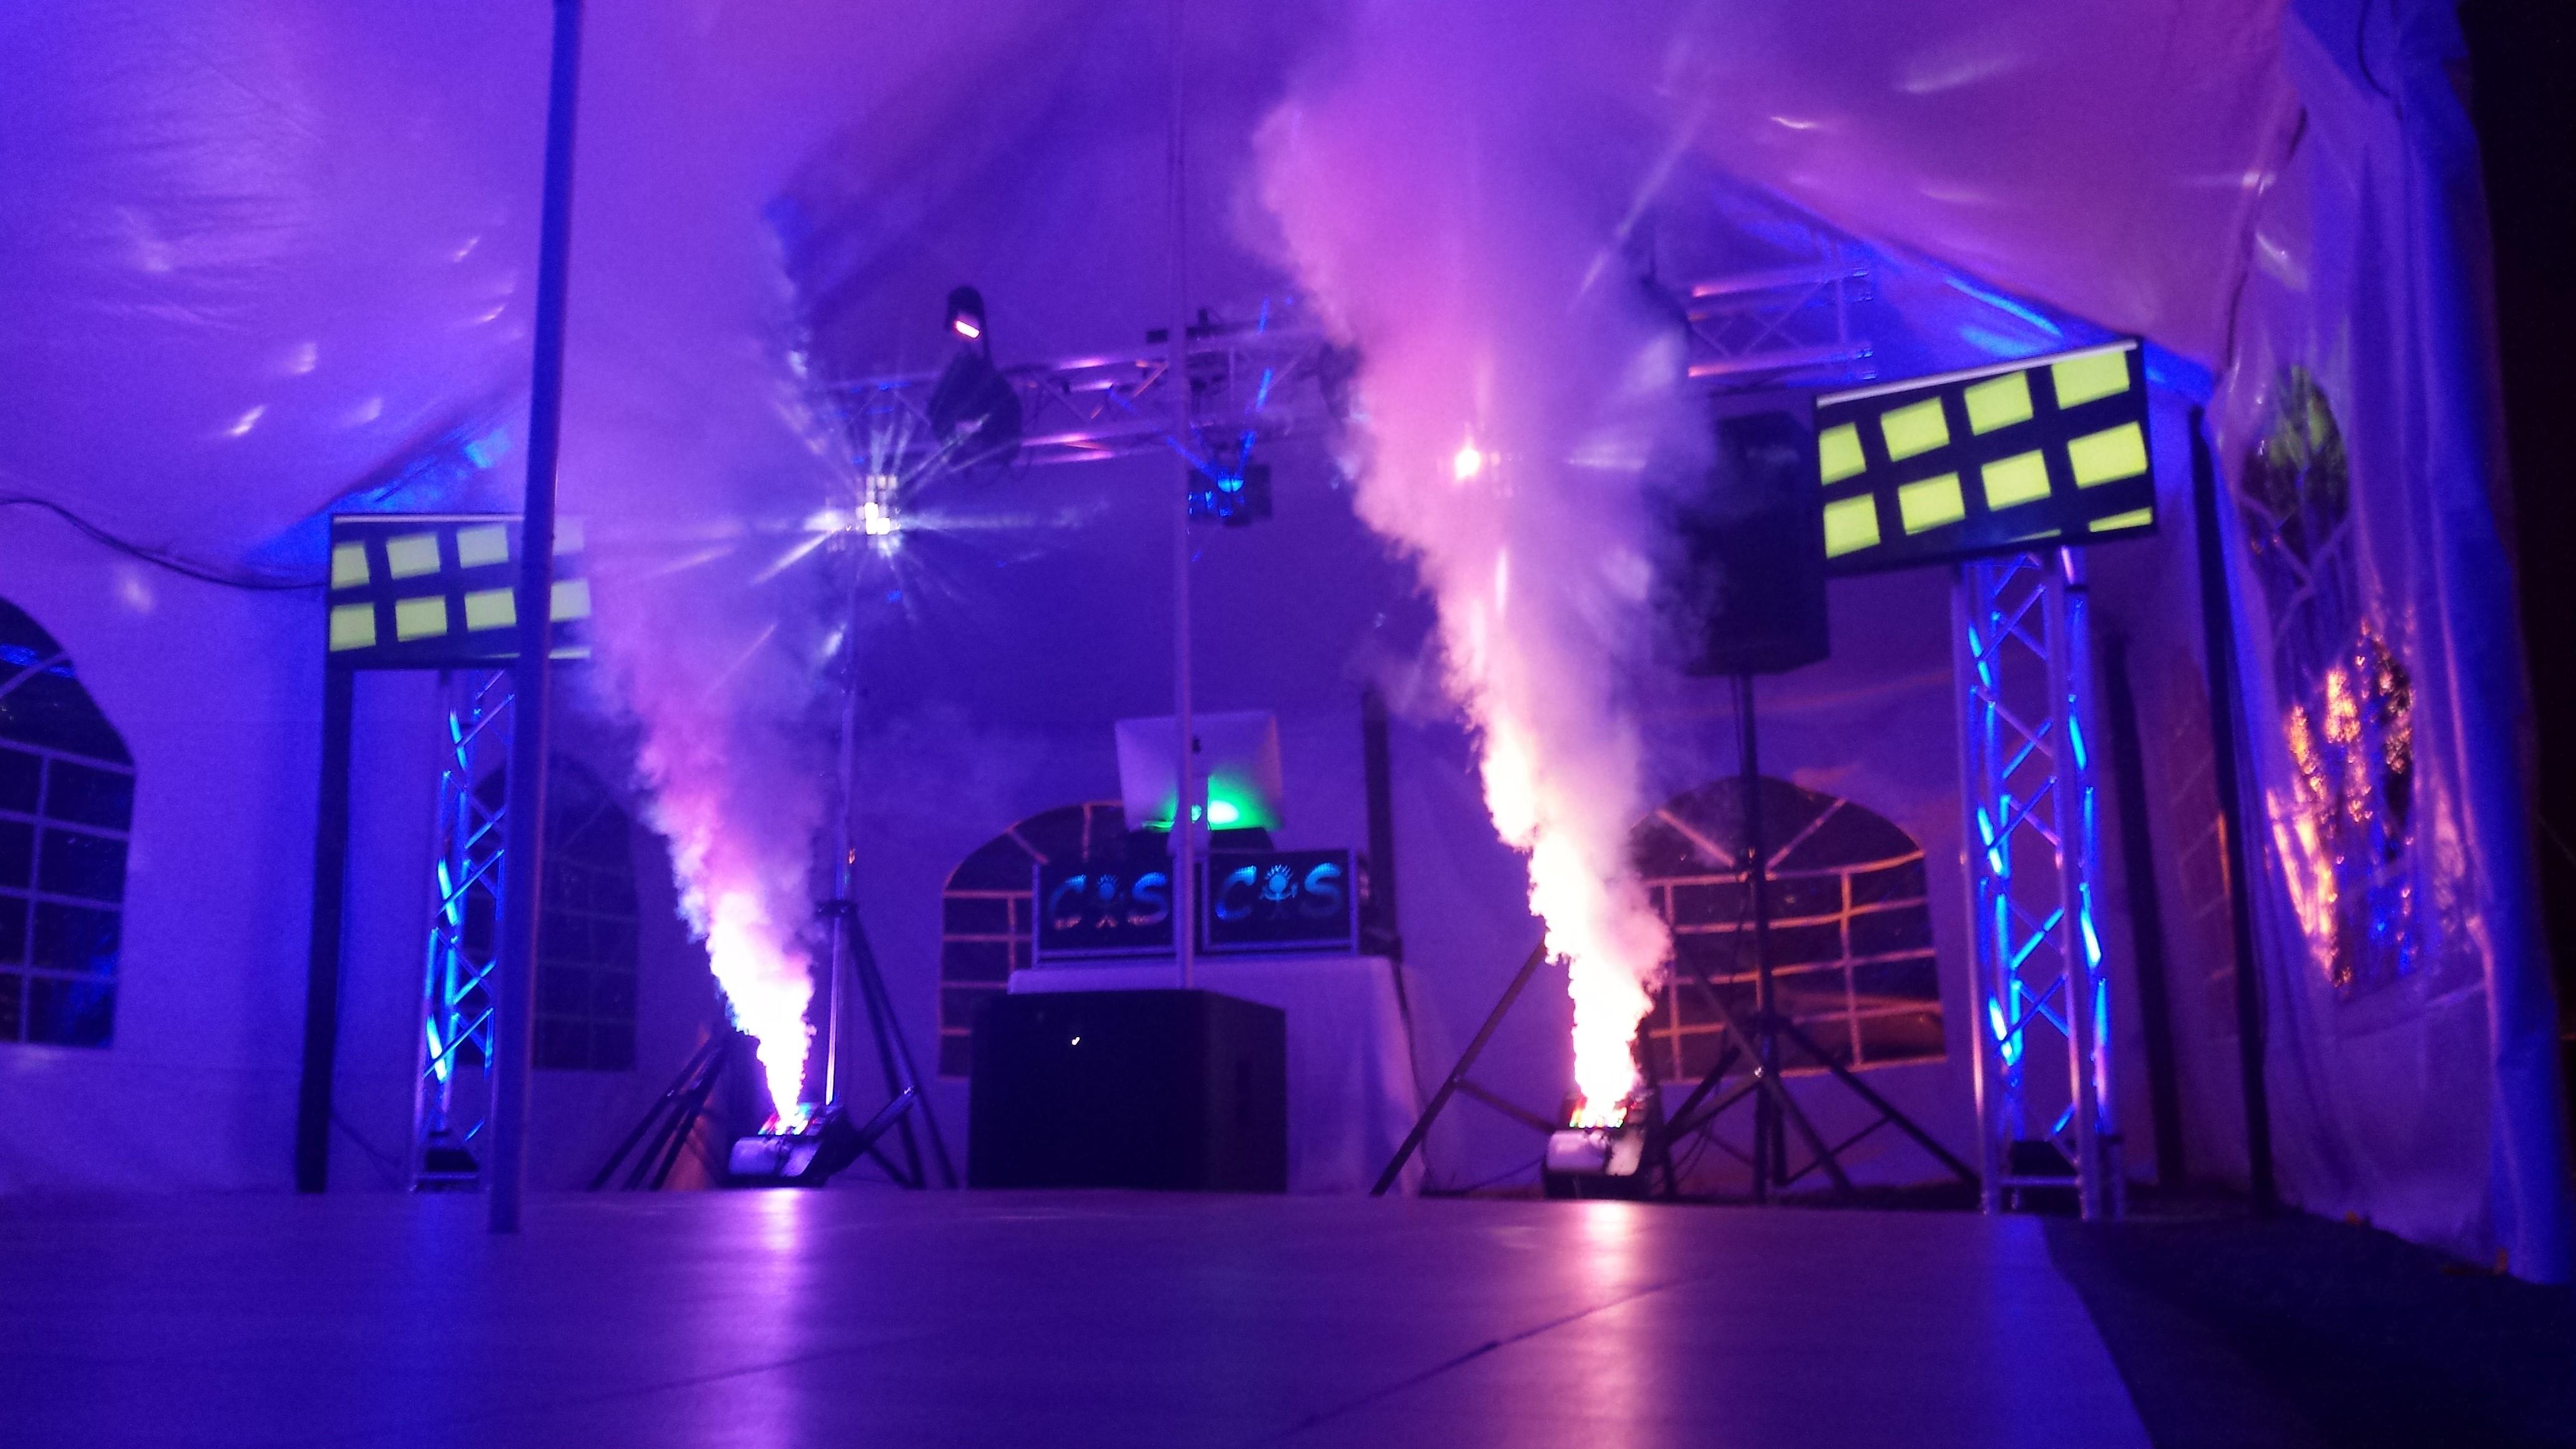 DJ Set Up With Foggers